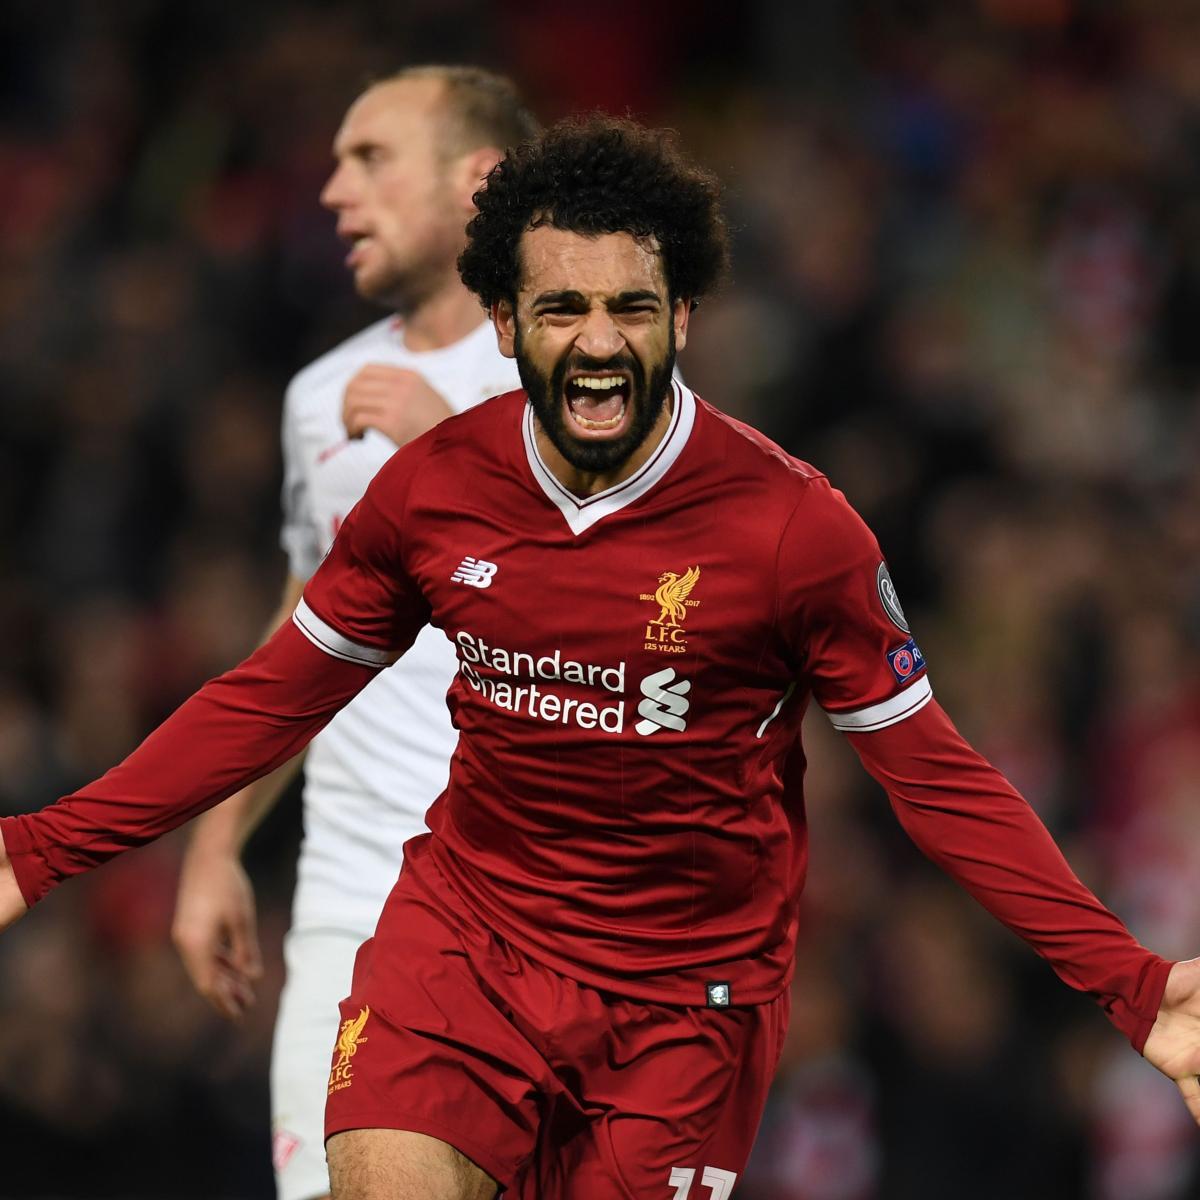 Liverpool News When Did The Premier League S Finest: How Liverpool's Mohamed Salah Has Taken The Premier League